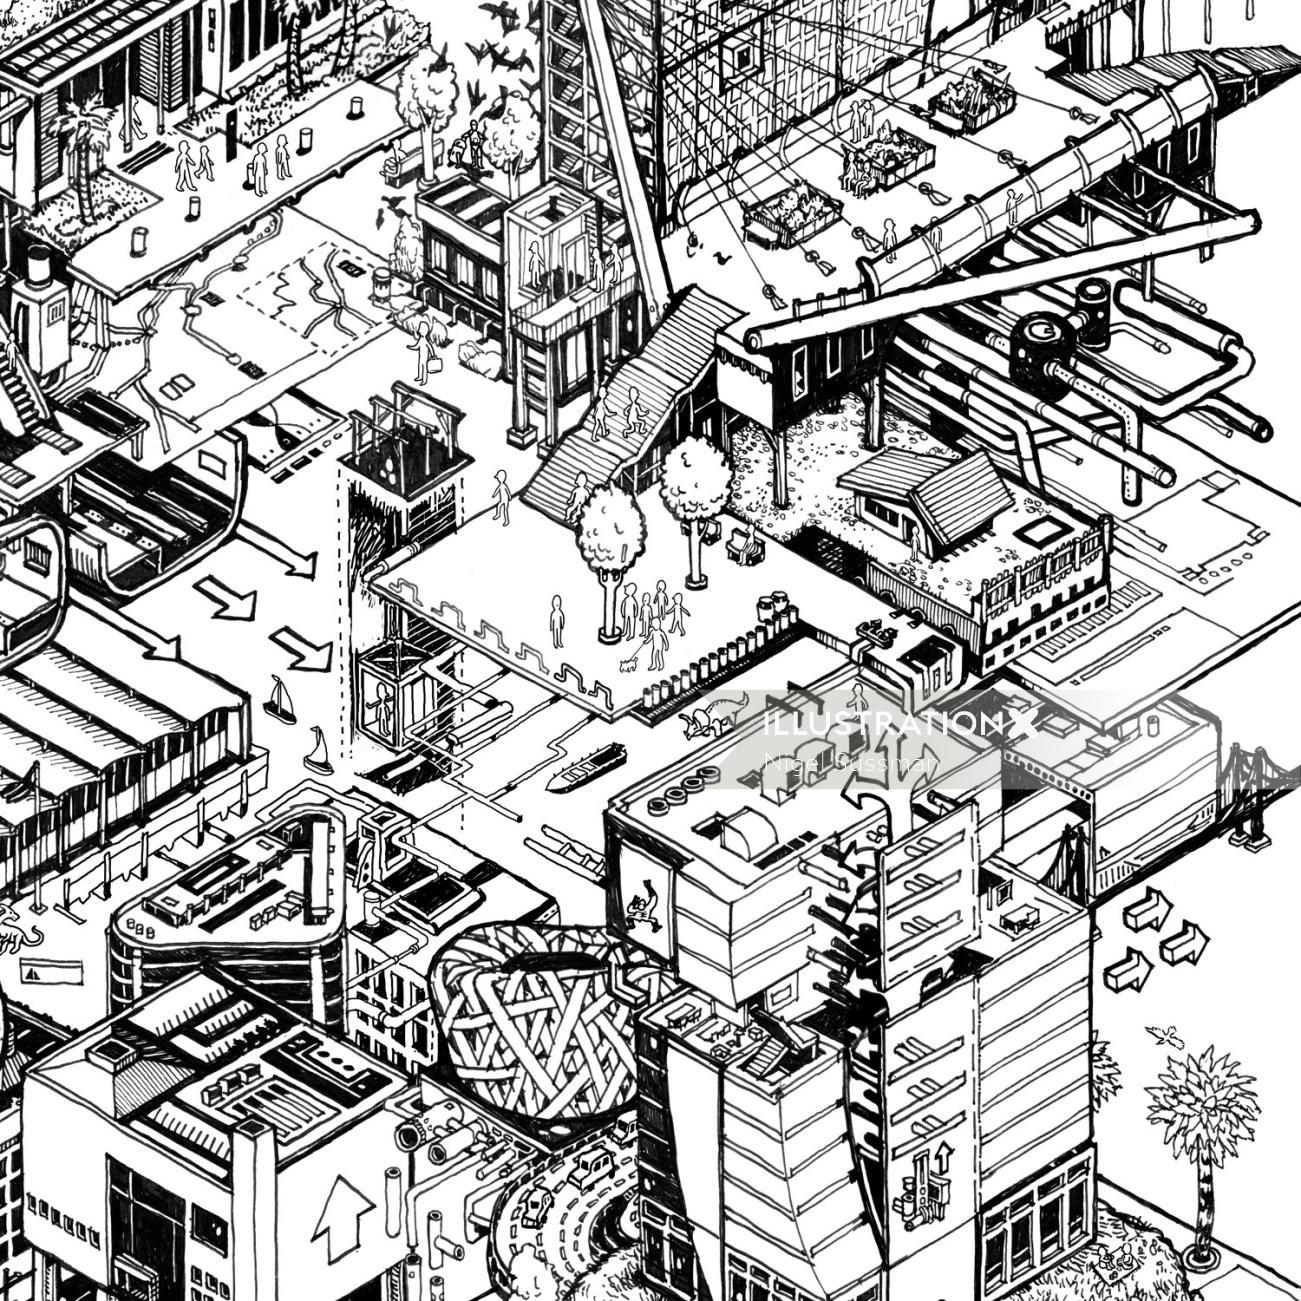 isometric fantasy architecture